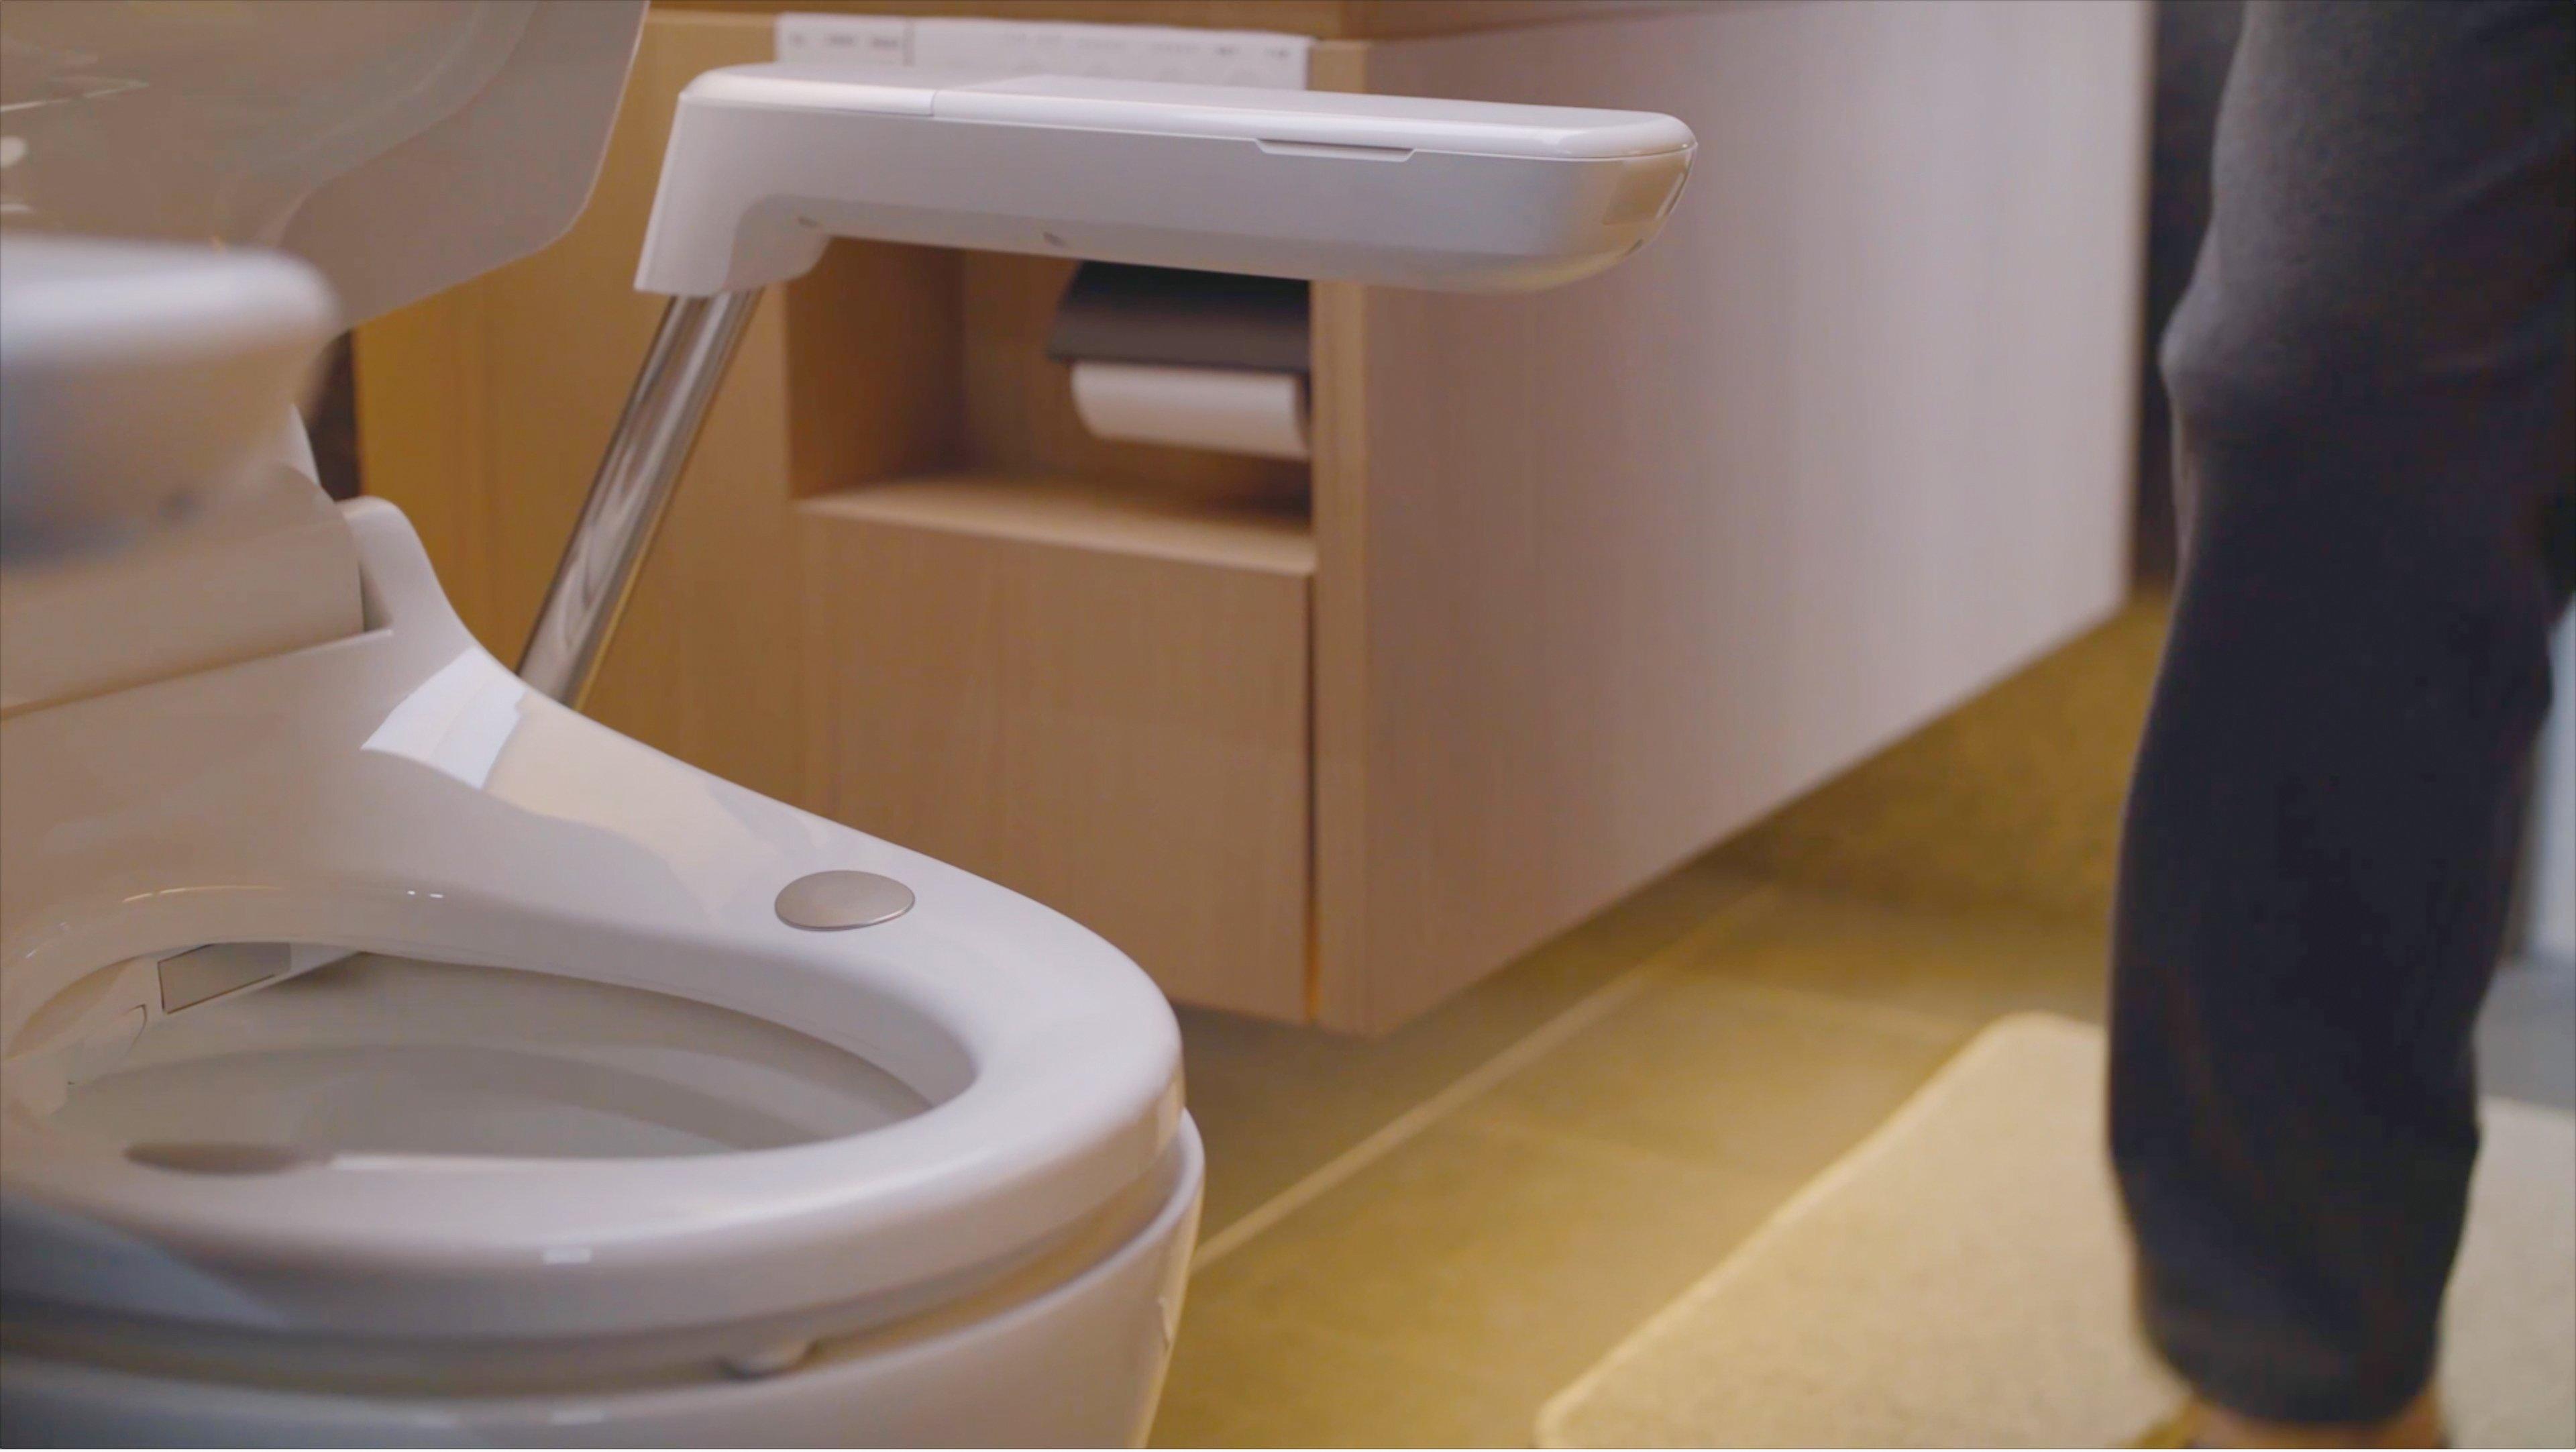 Photo: A bathroom that echoes customers' health data